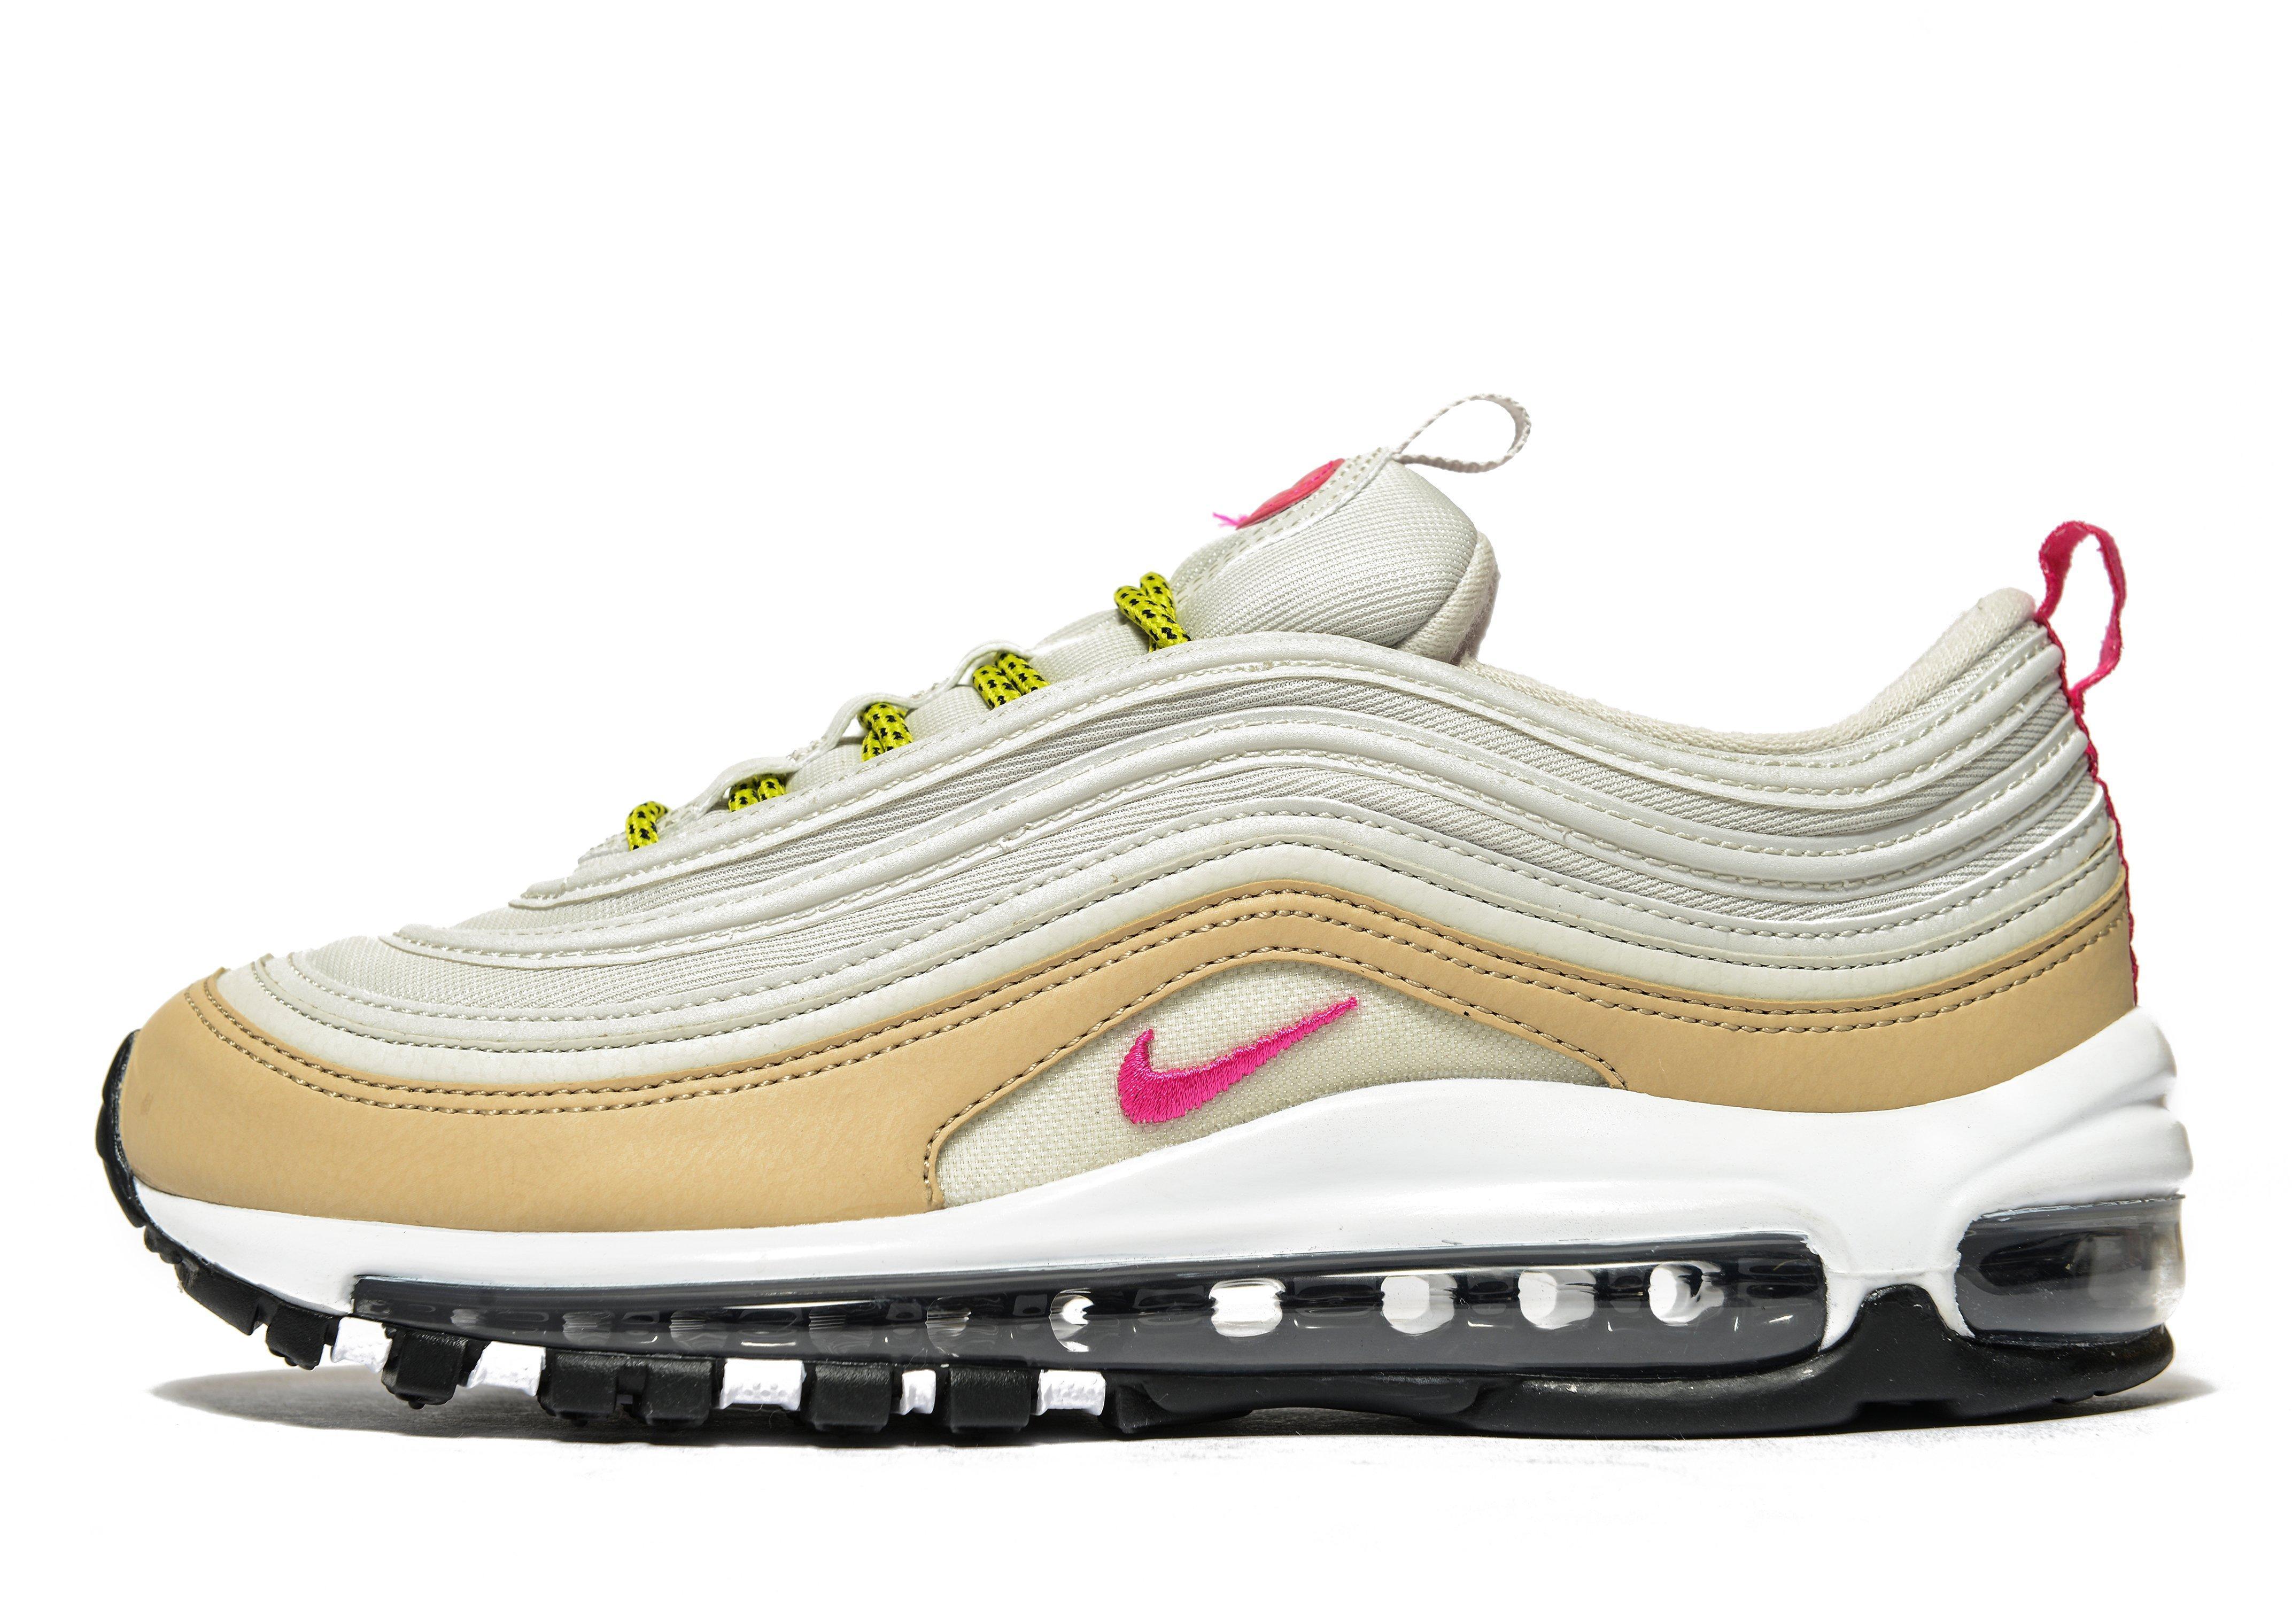 Nike air max 97 gunsmoke